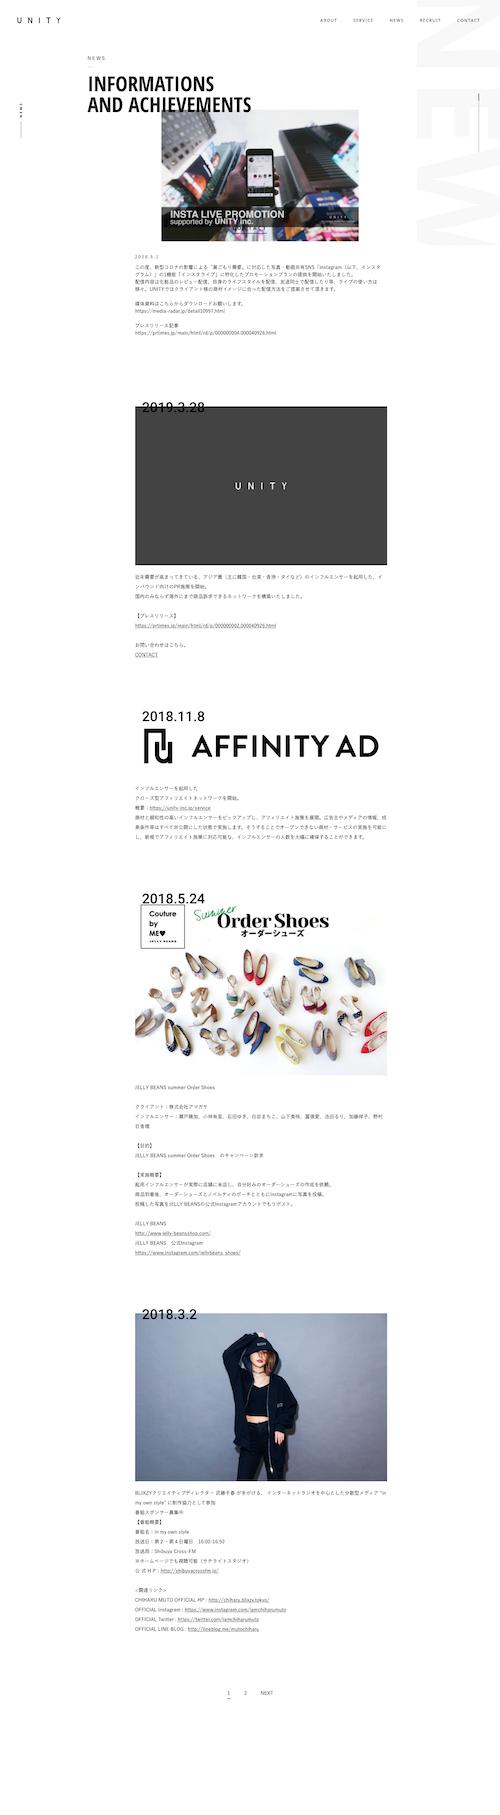 unity-inc-news